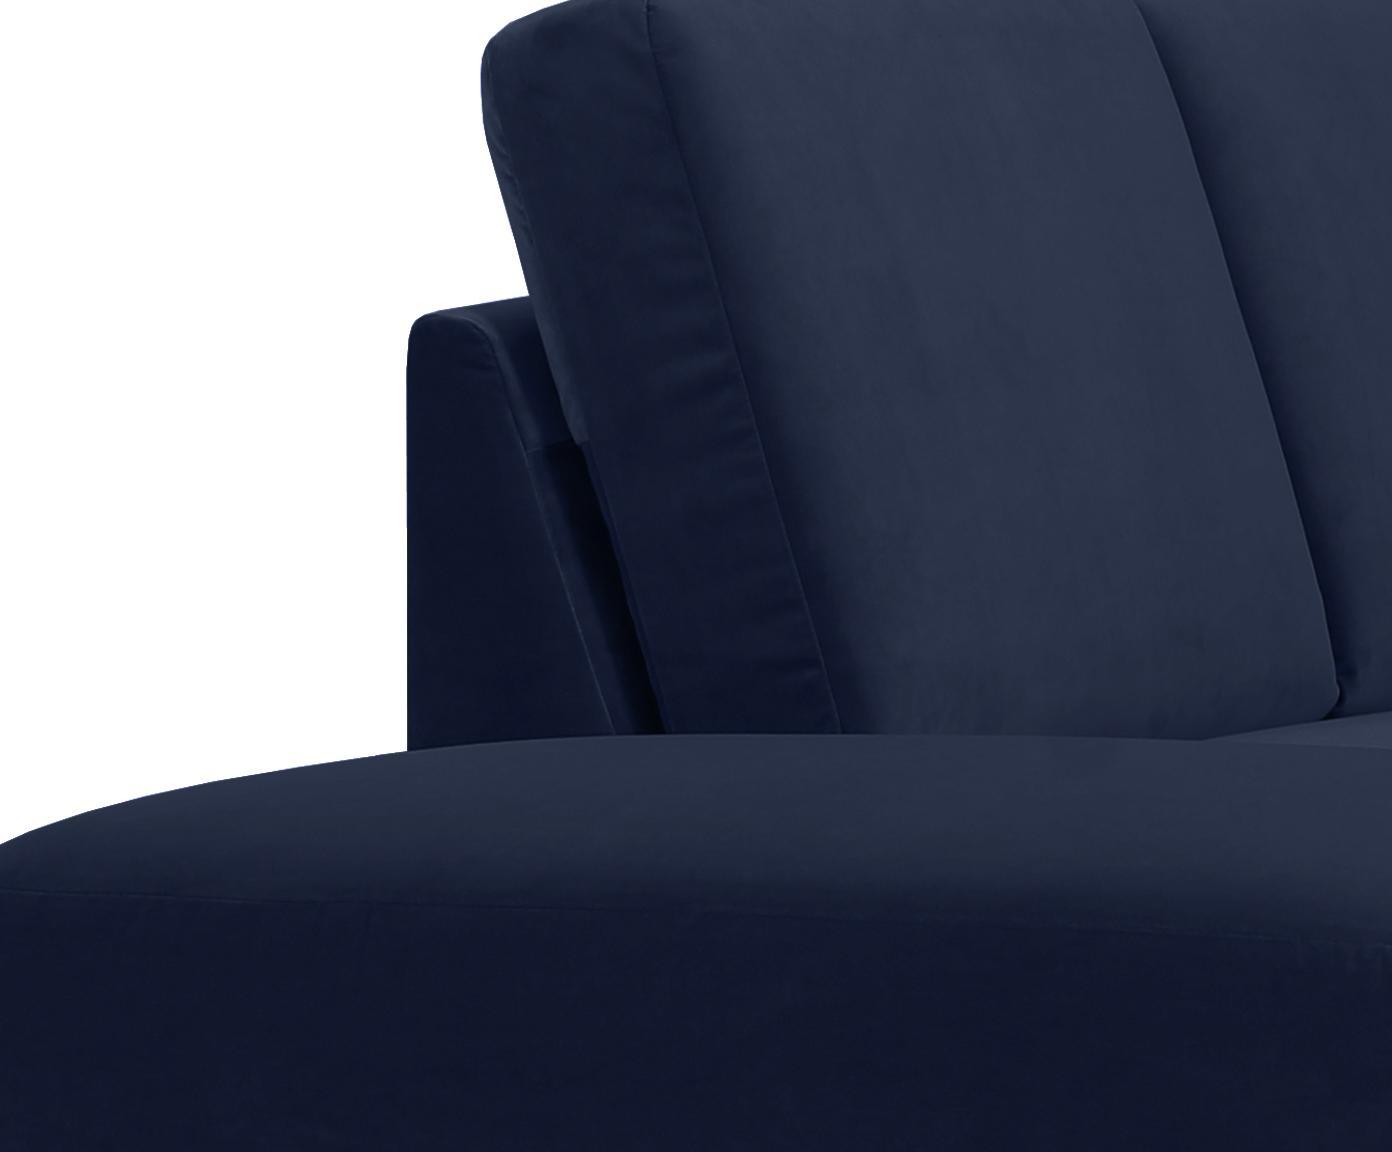 Samt-Ecksofa Fluente, Bezug: Samt (Hochwertiger Polyes, Gestell: Massives Kiefernholz, Füße: Metall, lackiert, Samt Dunkelblau, B 221 x T 200 cm